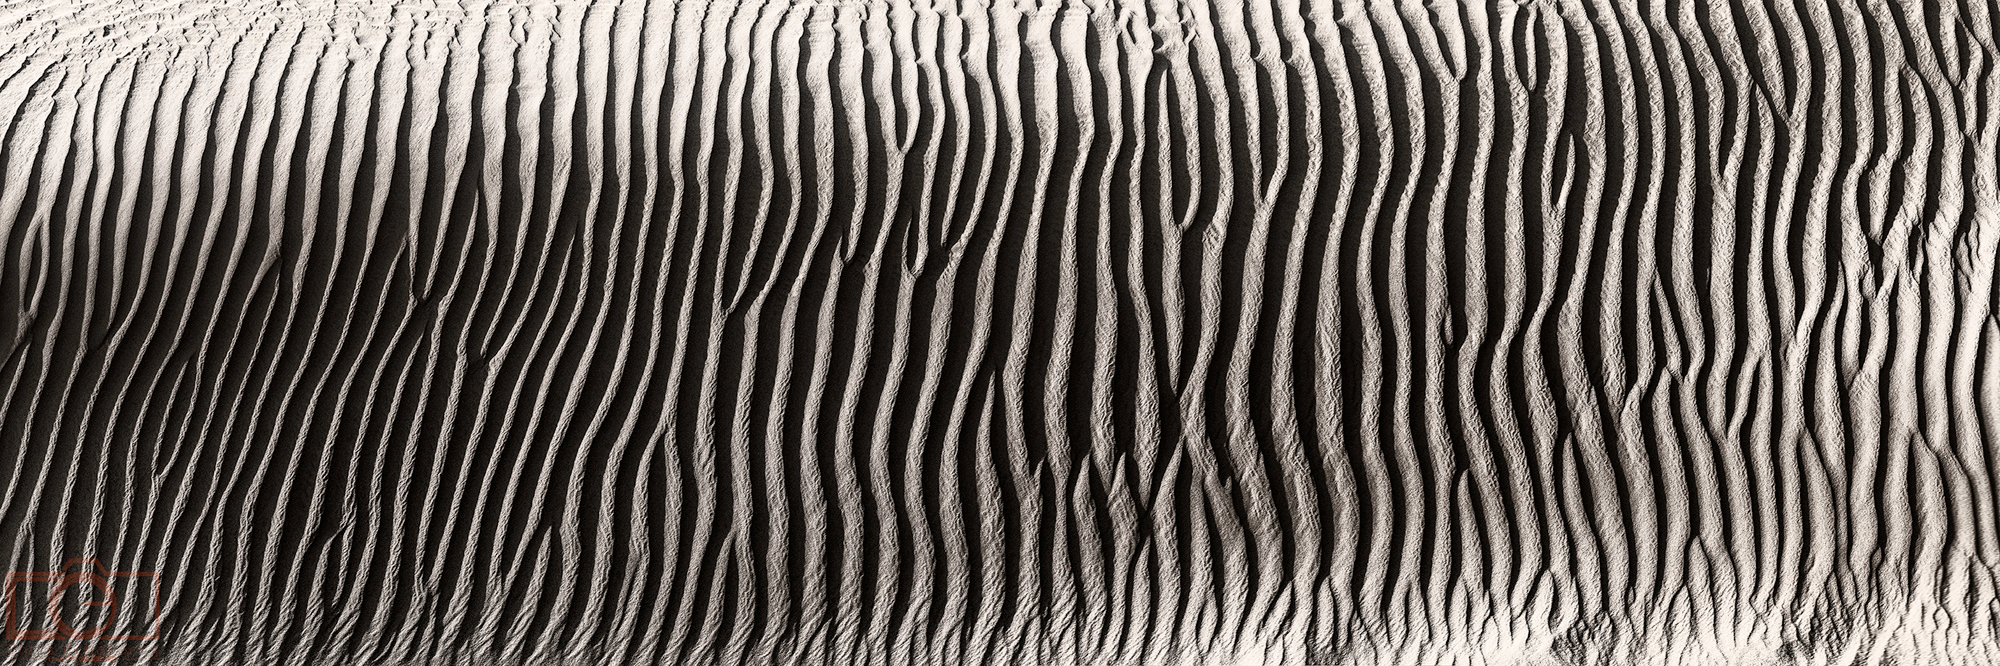 Zebra sand dunes california